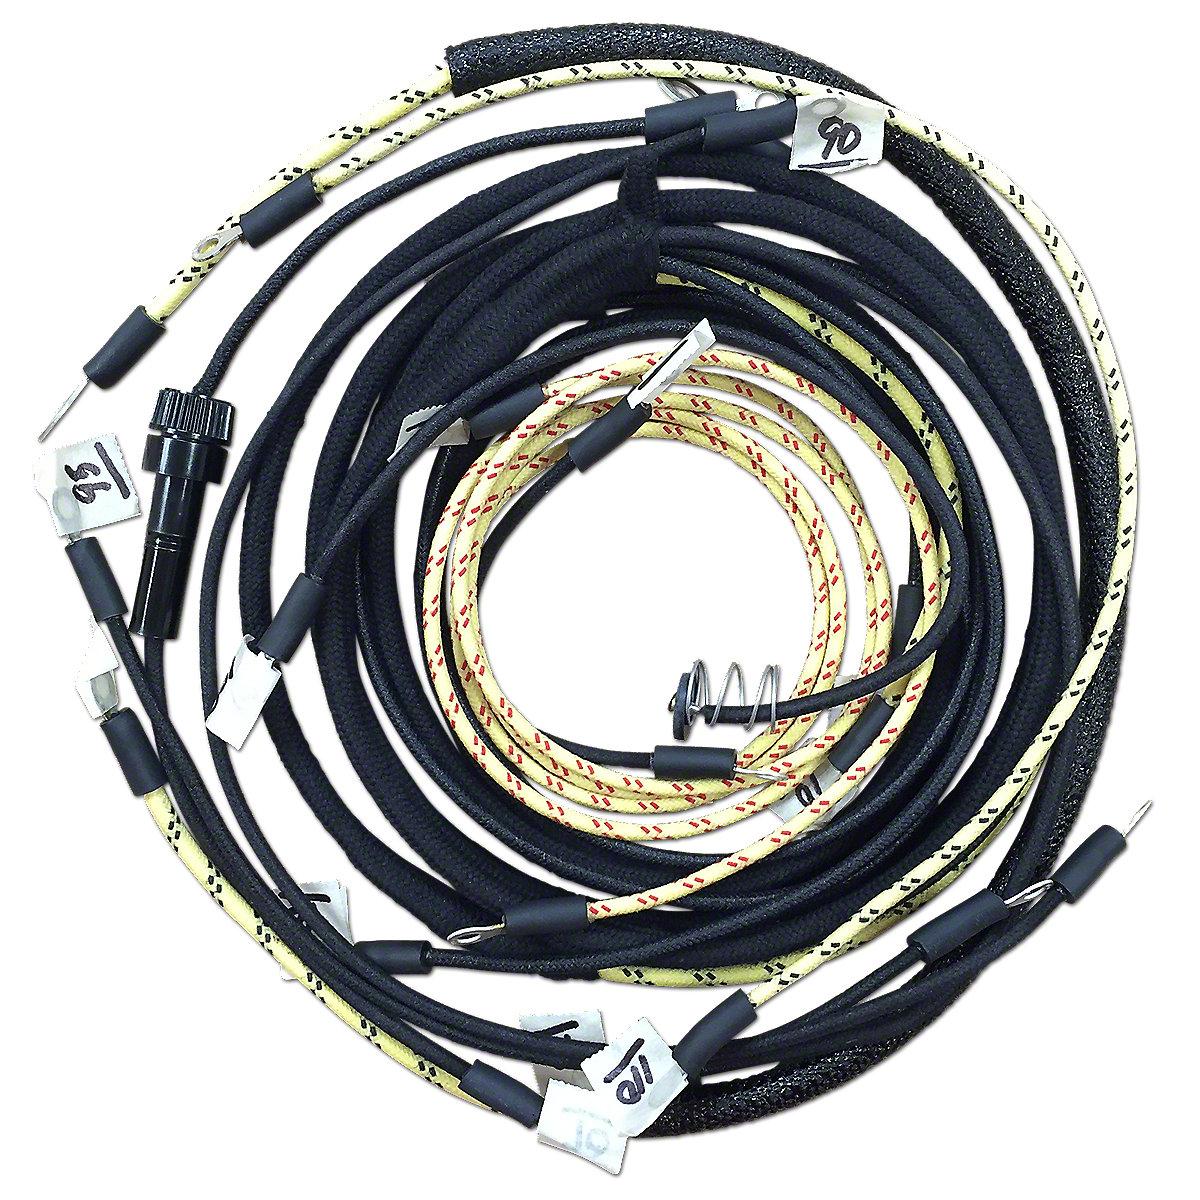 restoration quality wiring harness jds3572